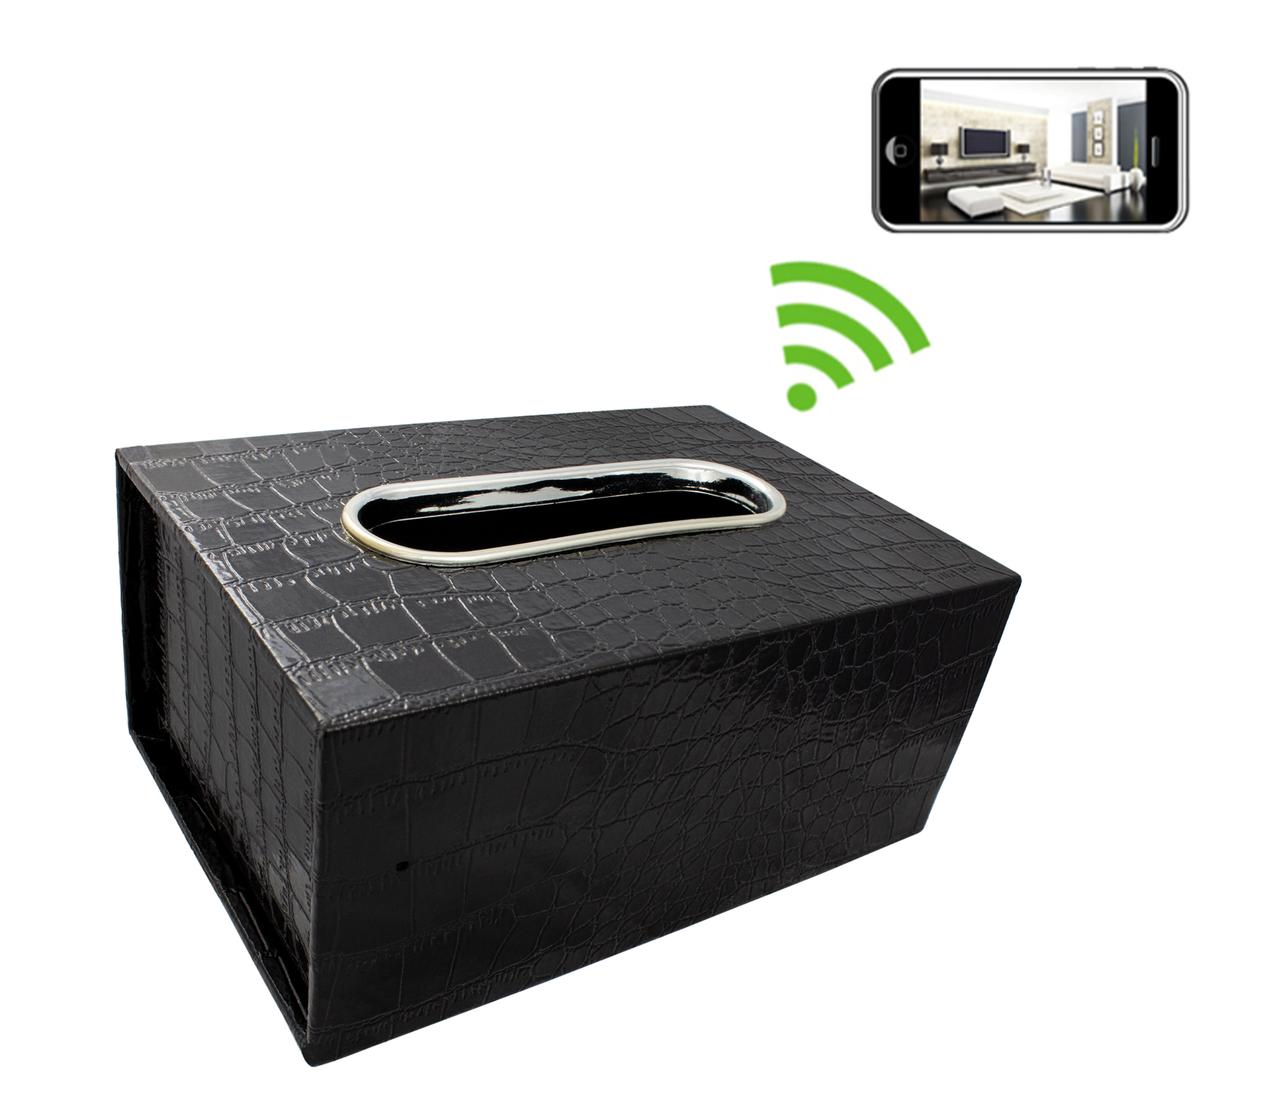 Tissue Box Hidden Camera with DVR 1280x720